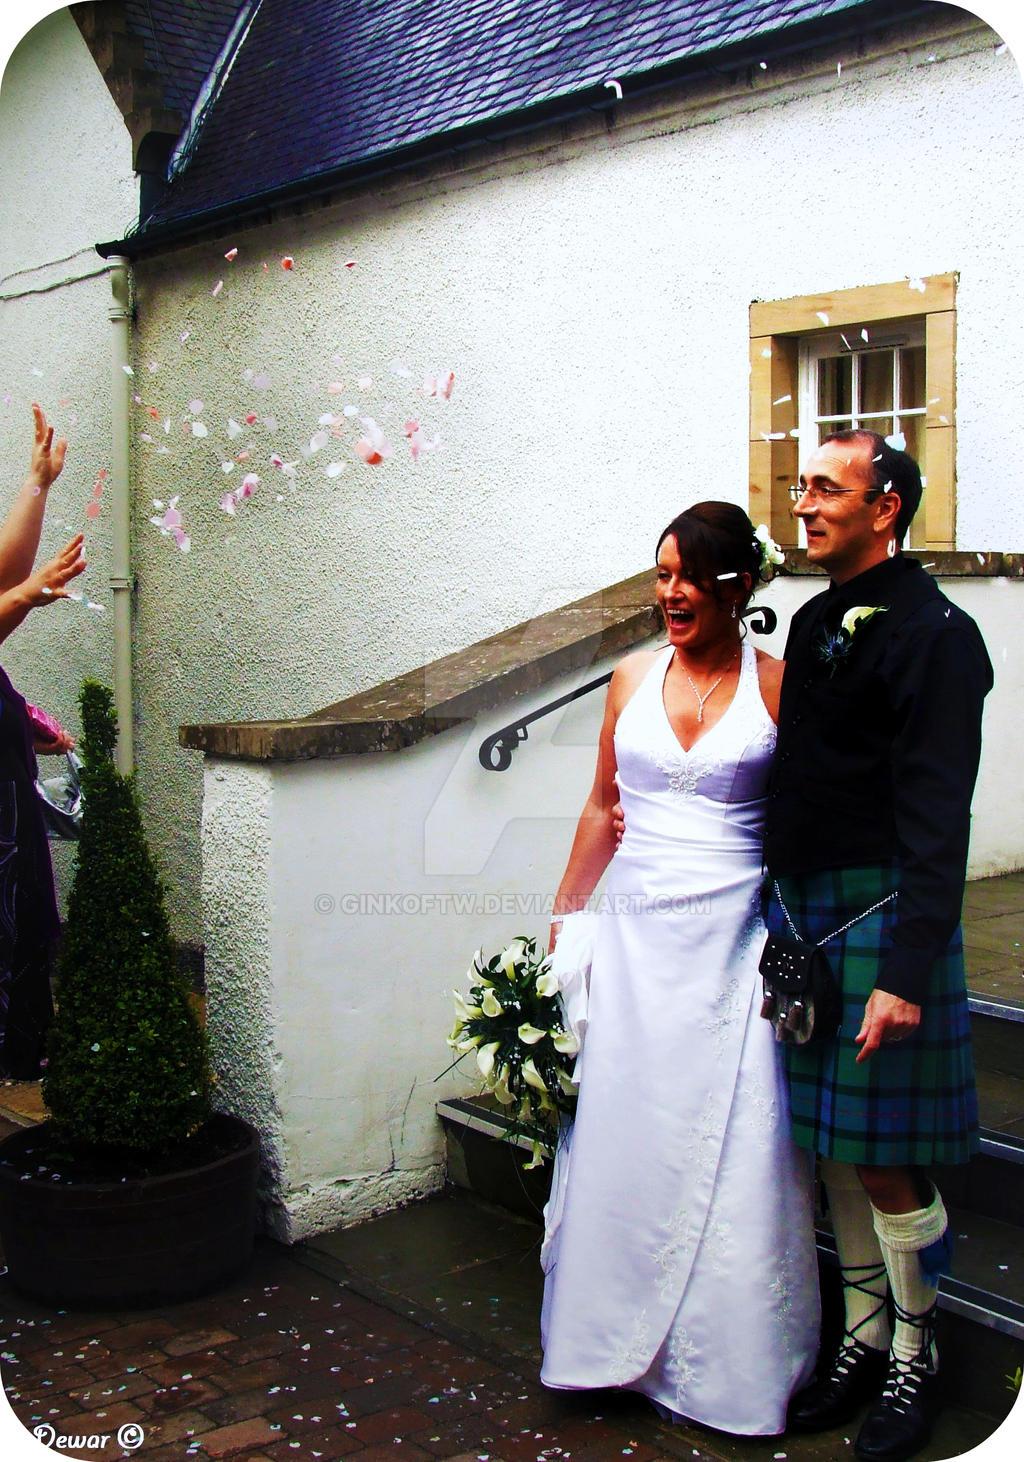 Wedding joy by Ginkoftw